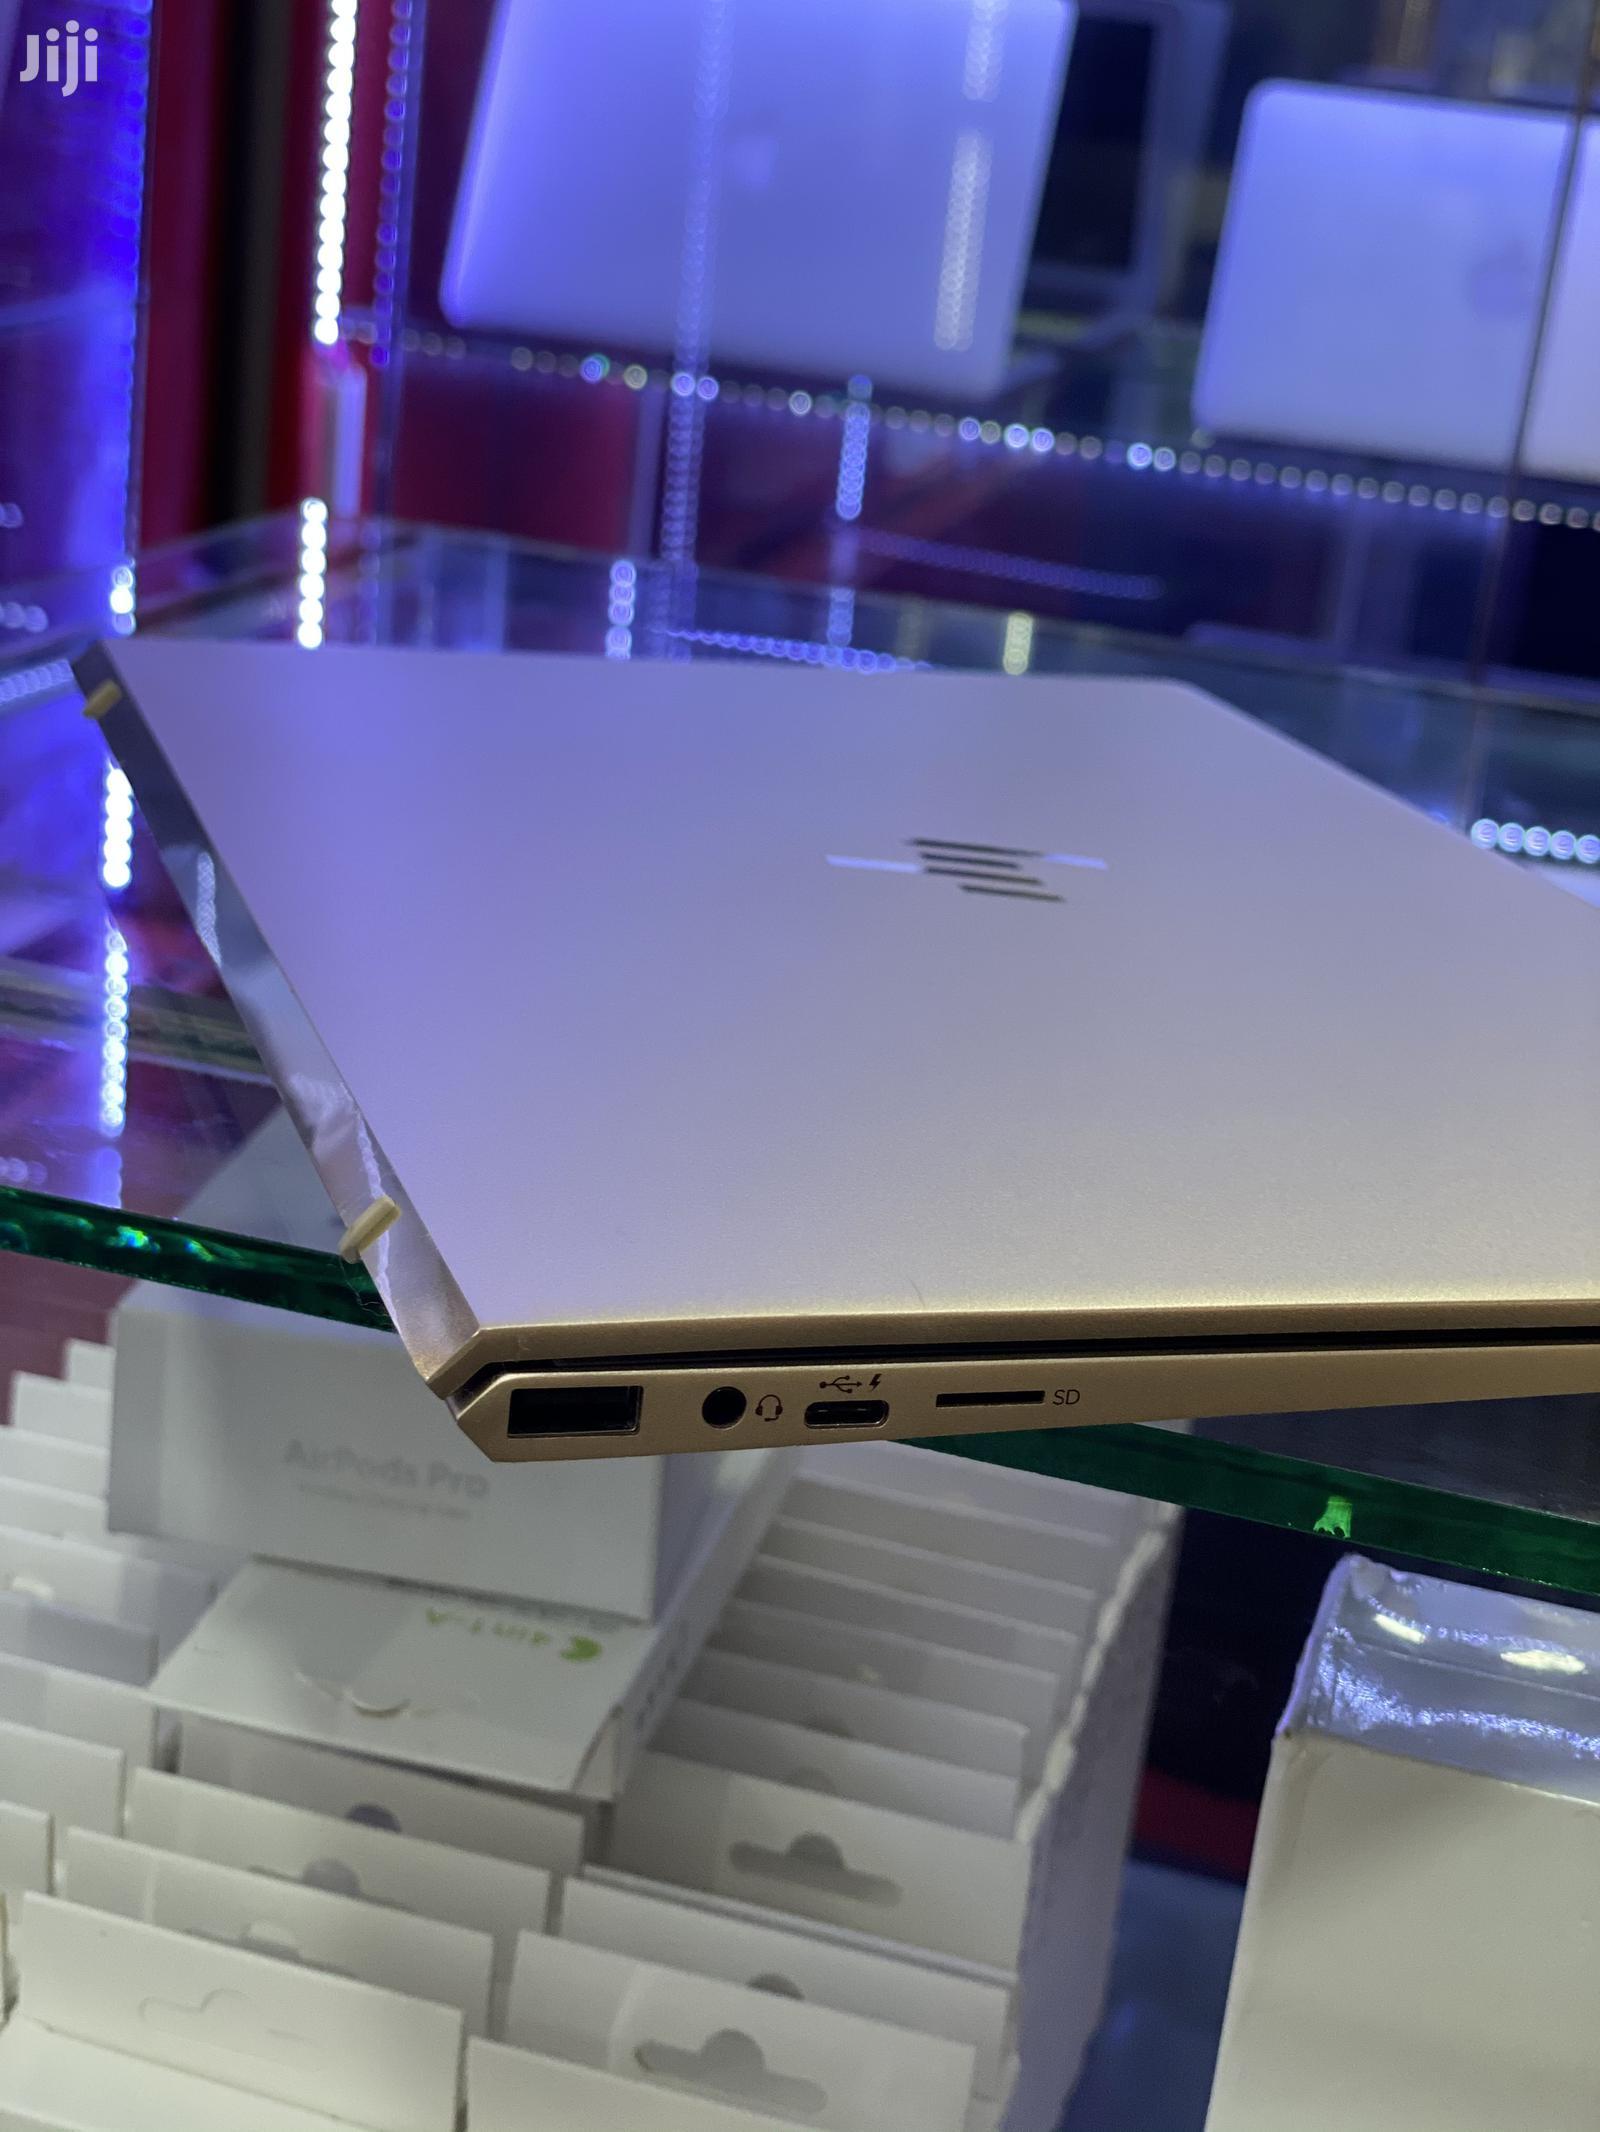 New Laptop HP Envy 13t 8GB Intel Core i5 SSHD (Hybrid) 256GB | Laptops & Computers for sale in Kampala, Central Region, Uganda